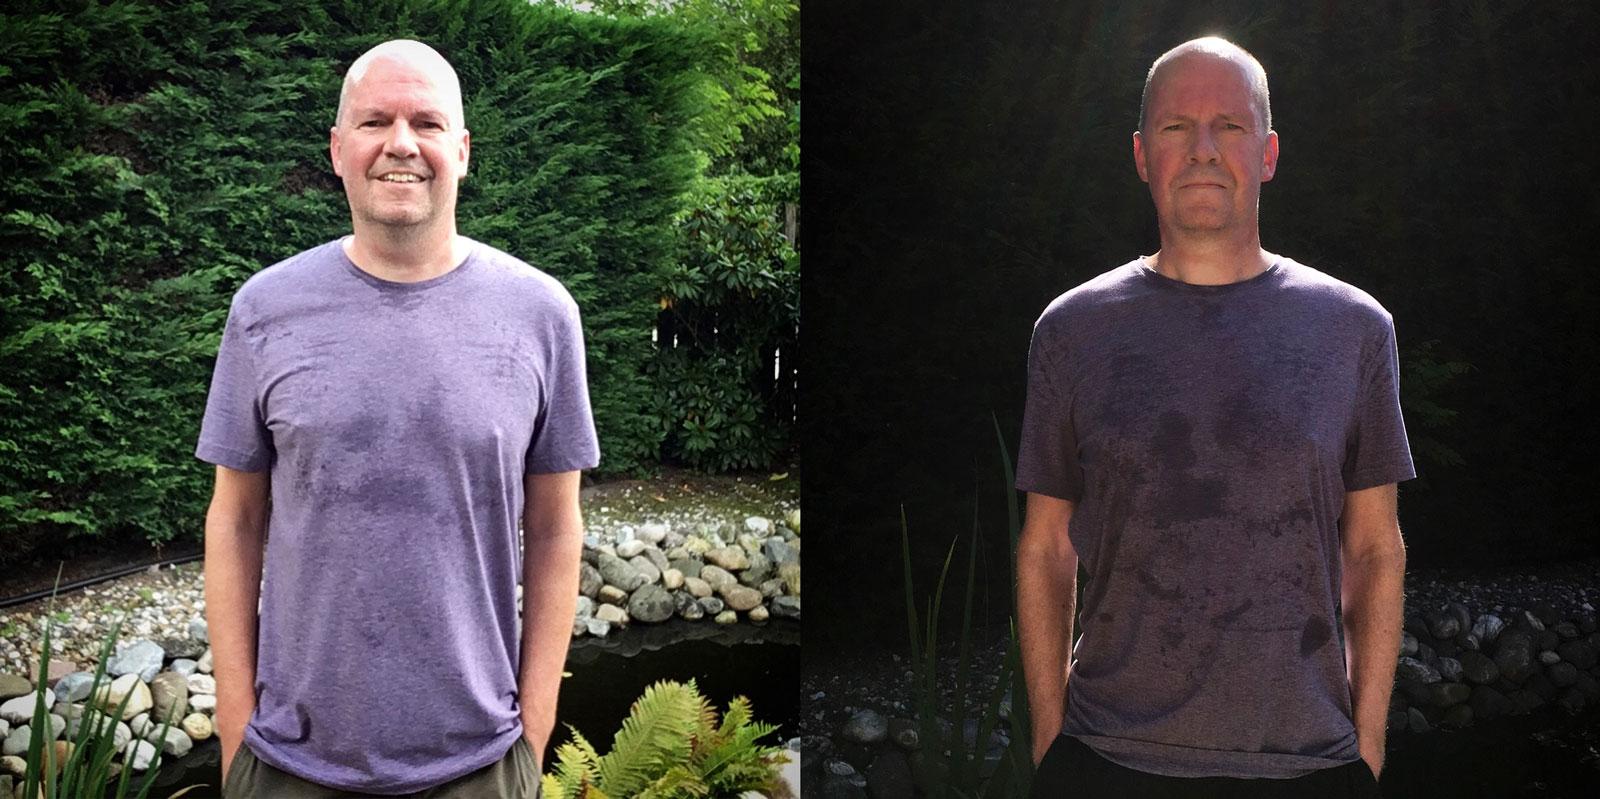 Eén jaar later... (links: 13/08/2017, rechts 08/07/2018)